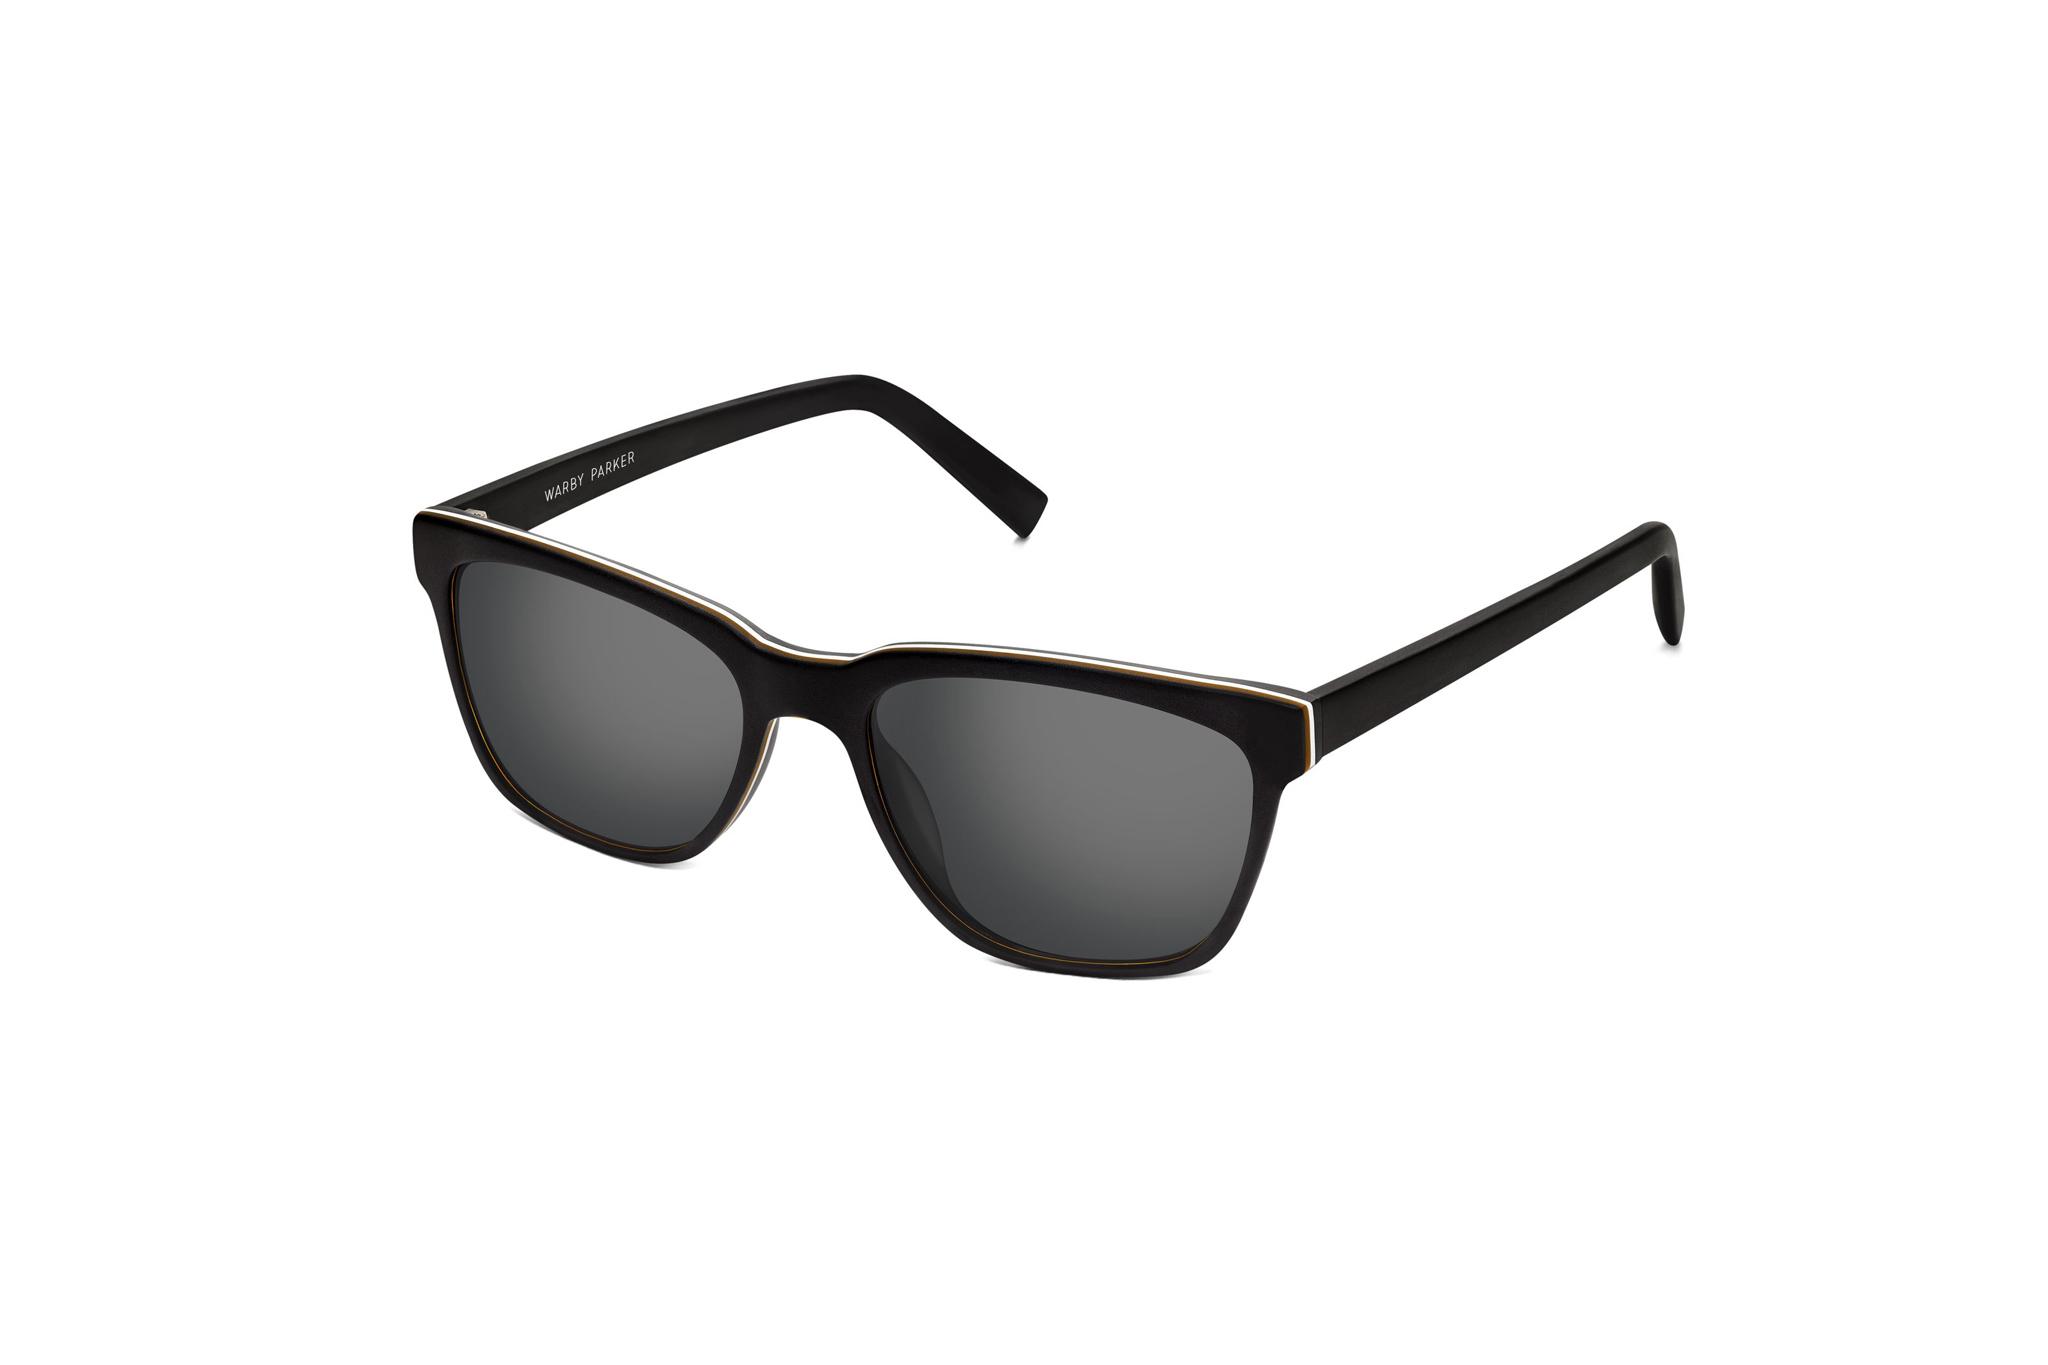 Warby Parker Barkley Sunglasses